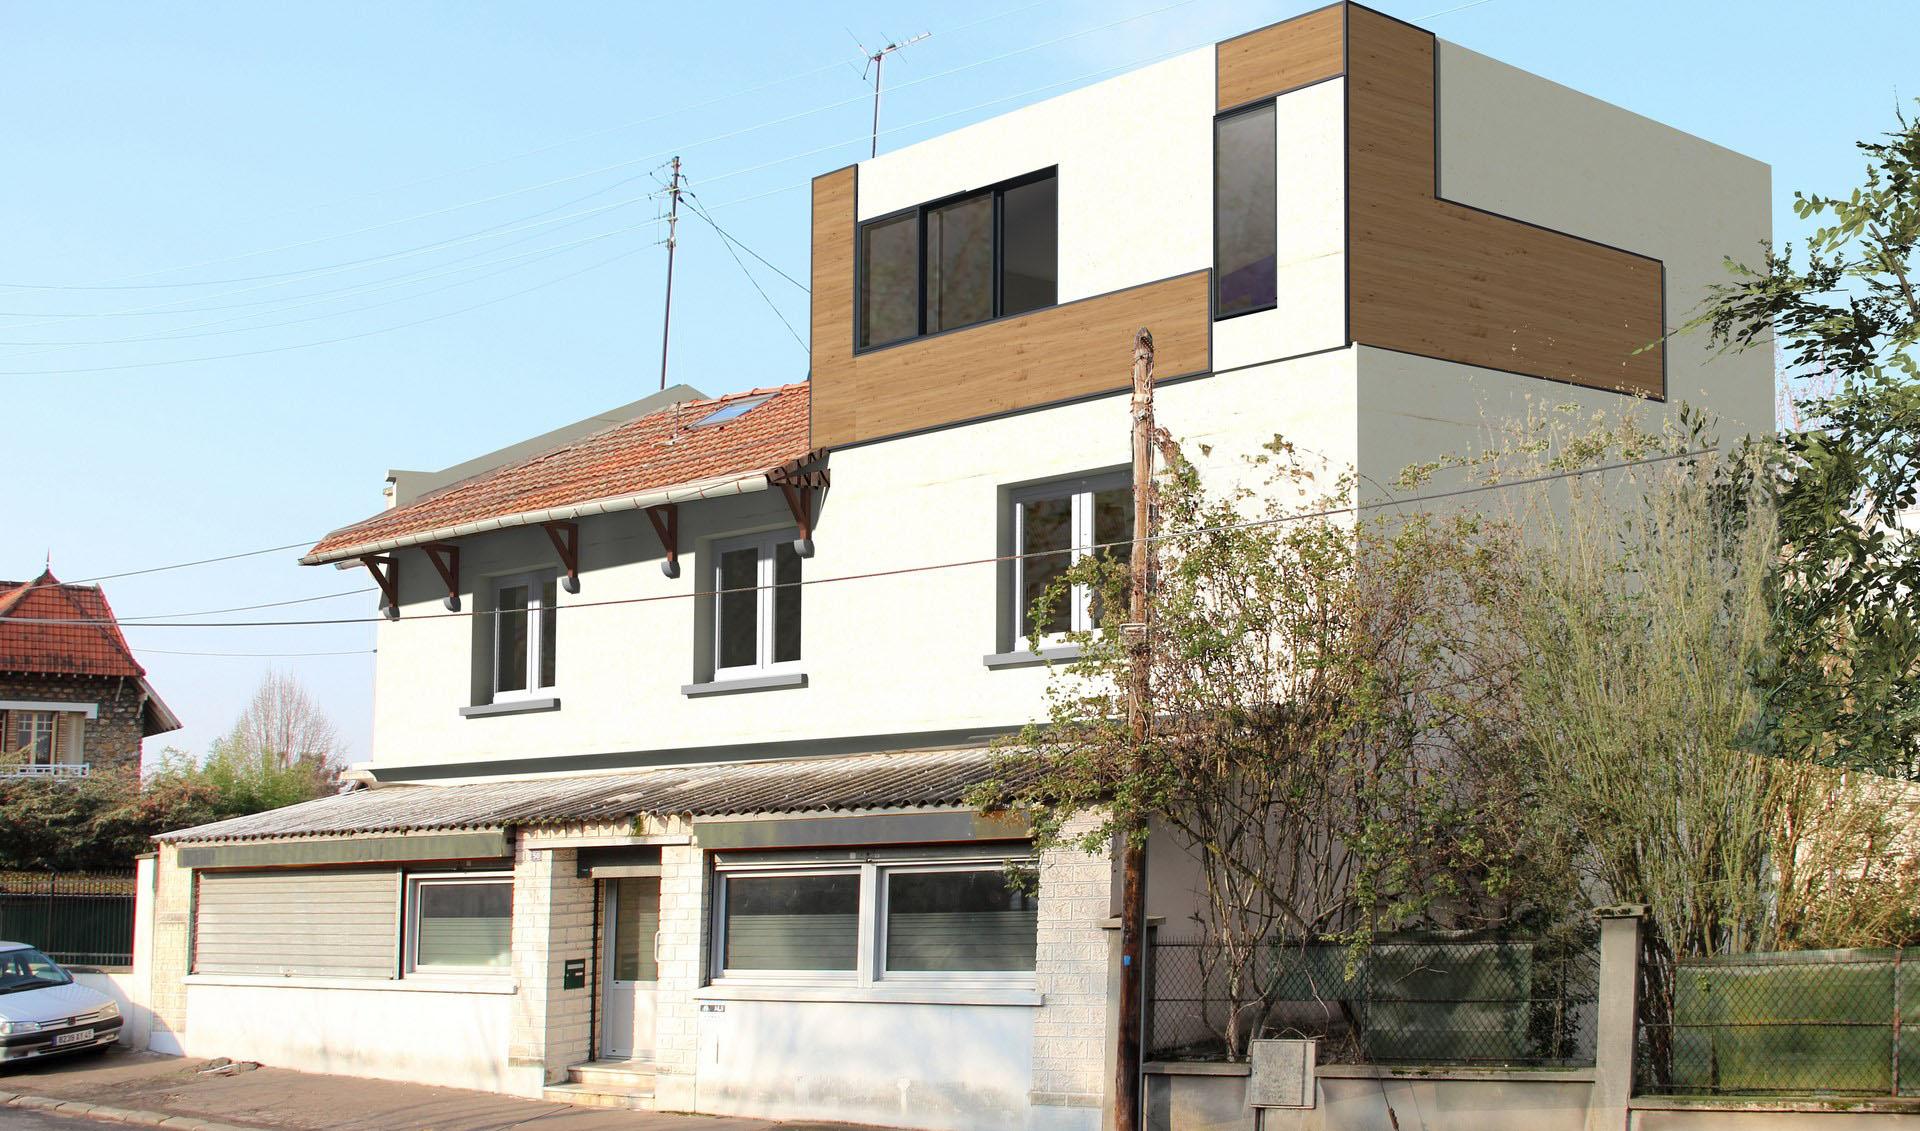 agrandir sa maison en hauteur agrandir sa maison en. Black Bedroom Furniture Sets. Home Design Ideas